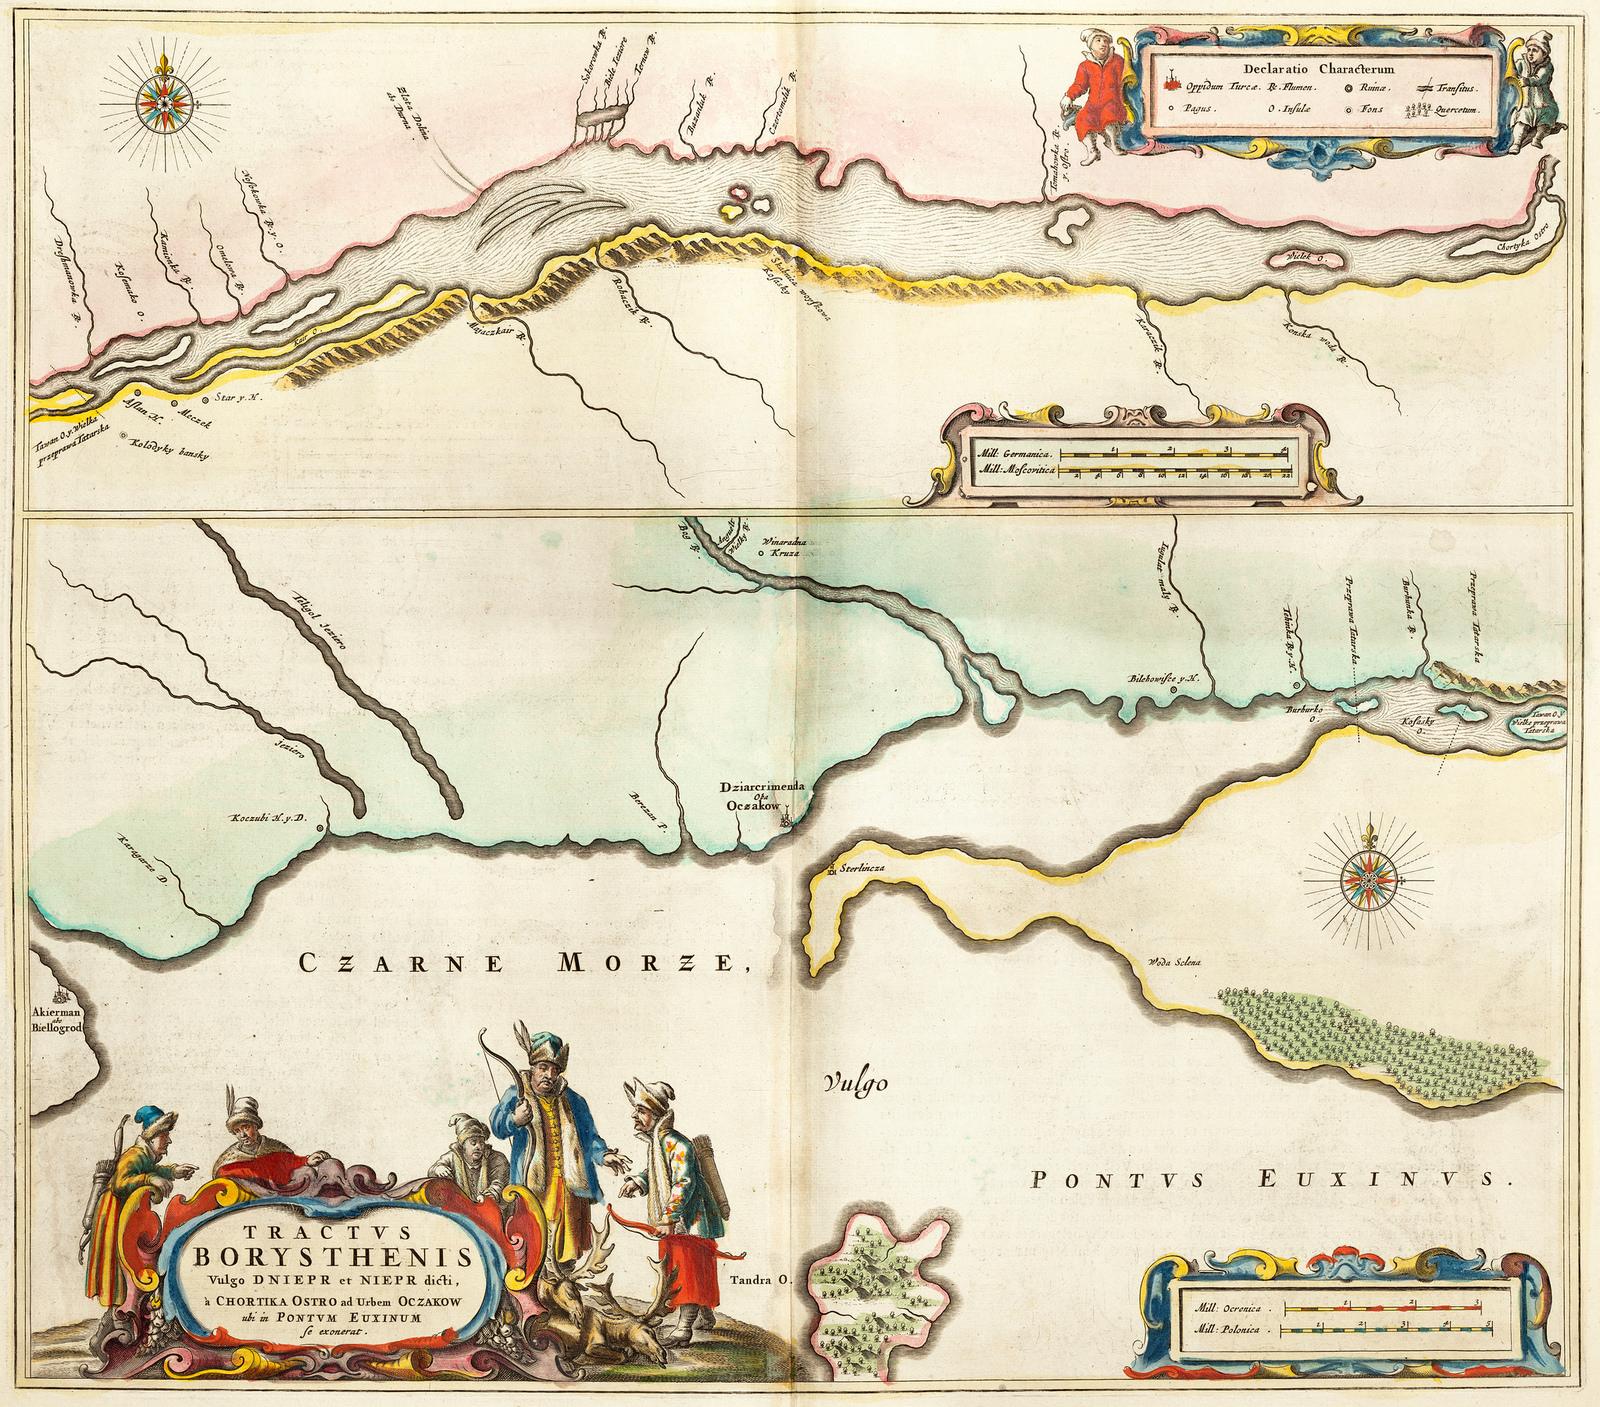 Tractus Borysthenis 1662(3)